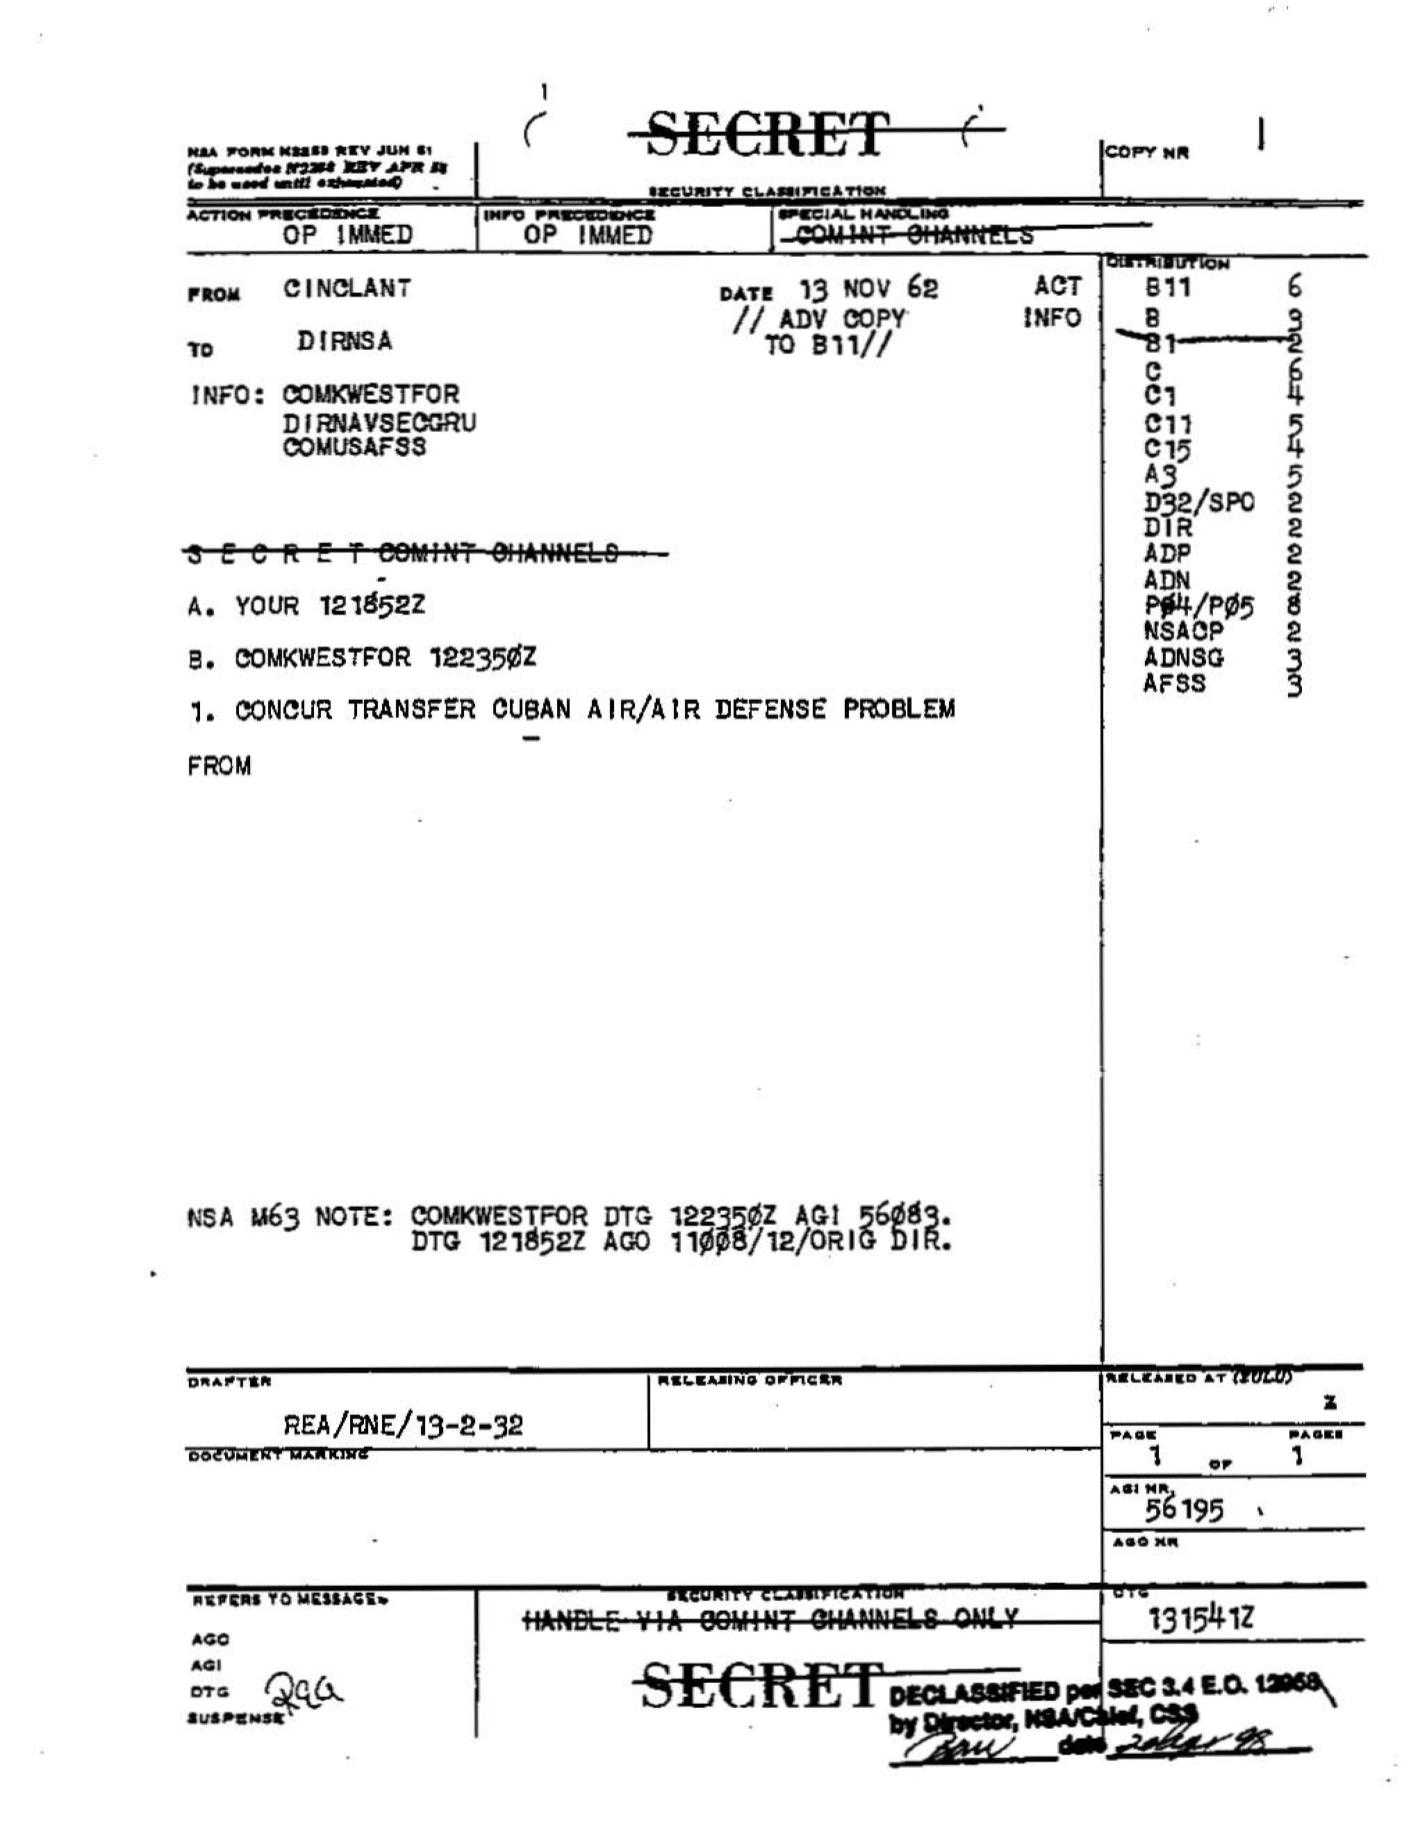 13_NOVEMBER_COMMANDER_IN_CHIEF.PDF